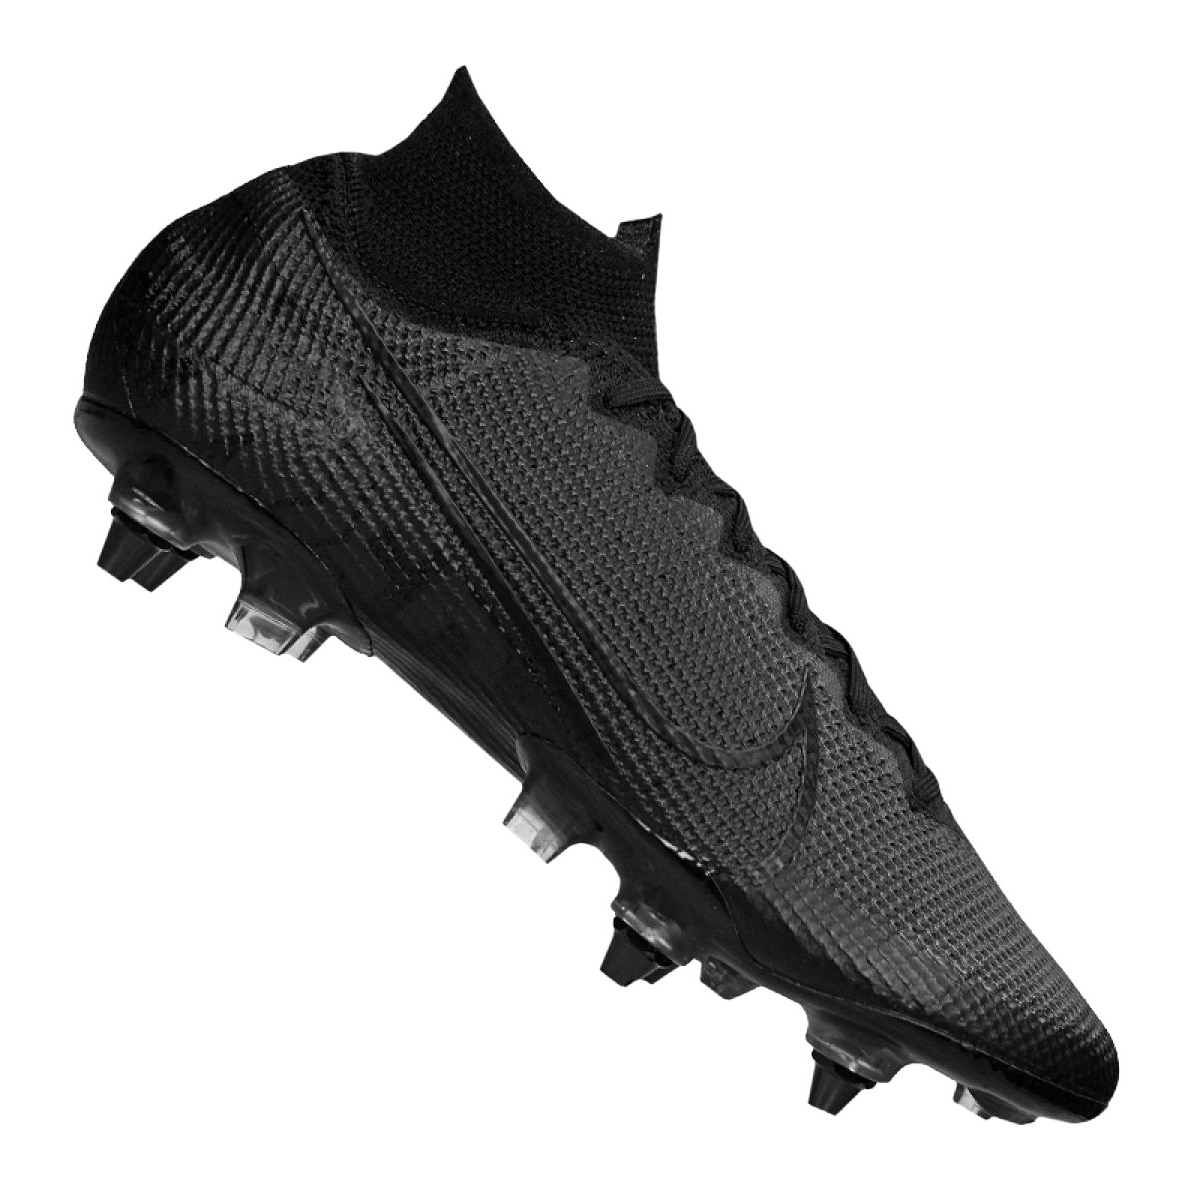 Fussballschuhe Nike Superfly 7 Elite Sg Pro Ac M At7894 001 Schwarz Schwarz